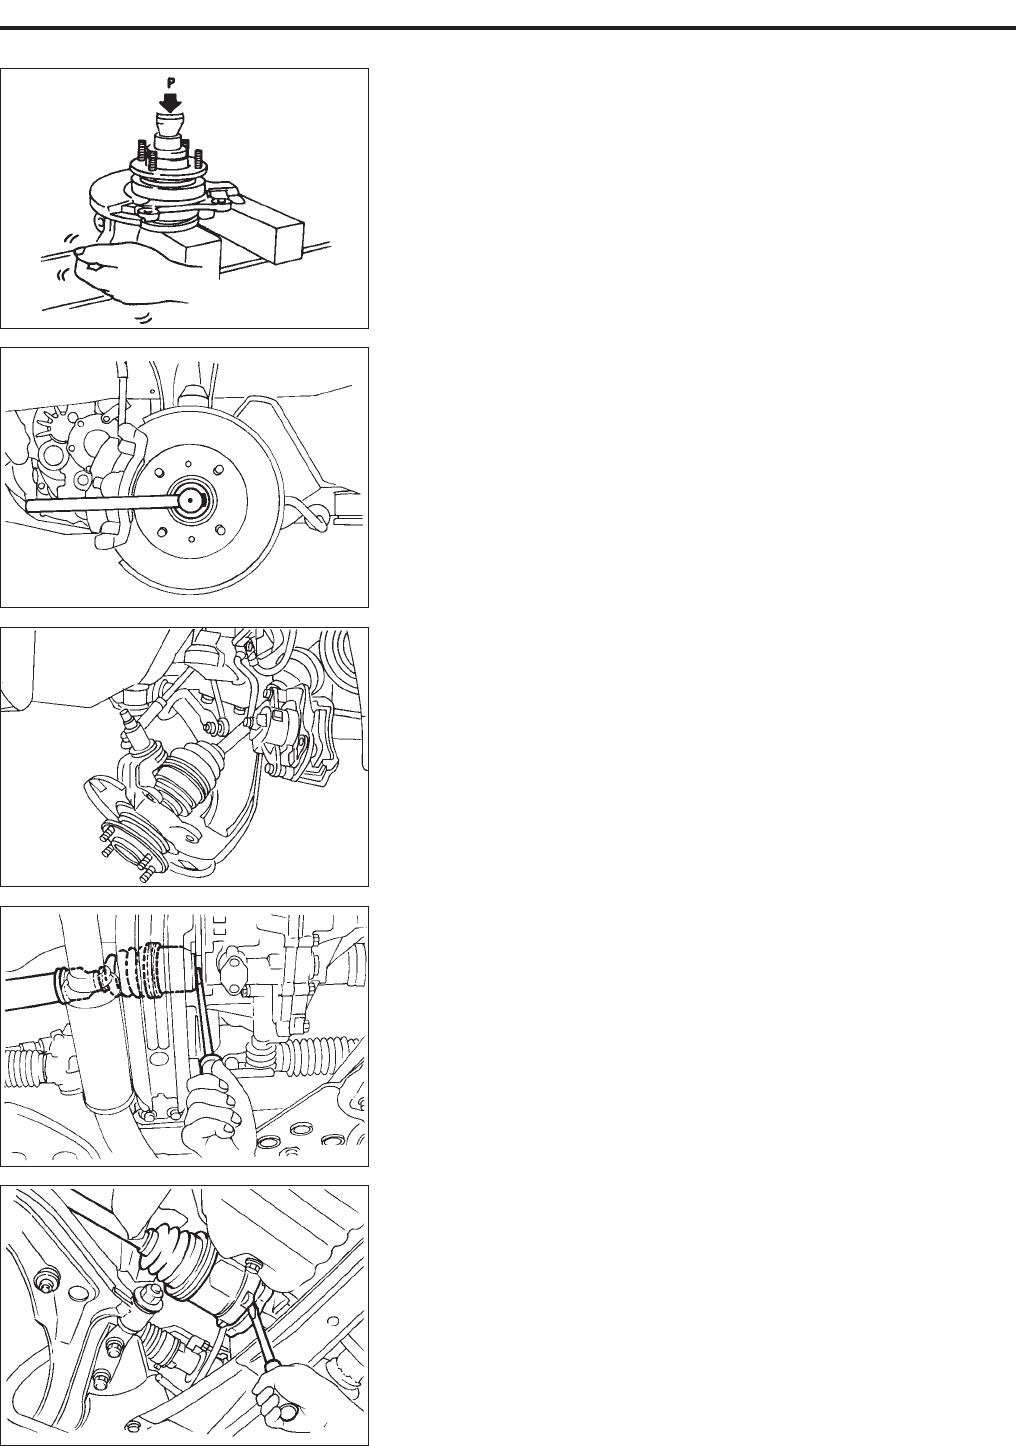 Nissan Primera P11 Workshop Manual 2000 11 Pdf